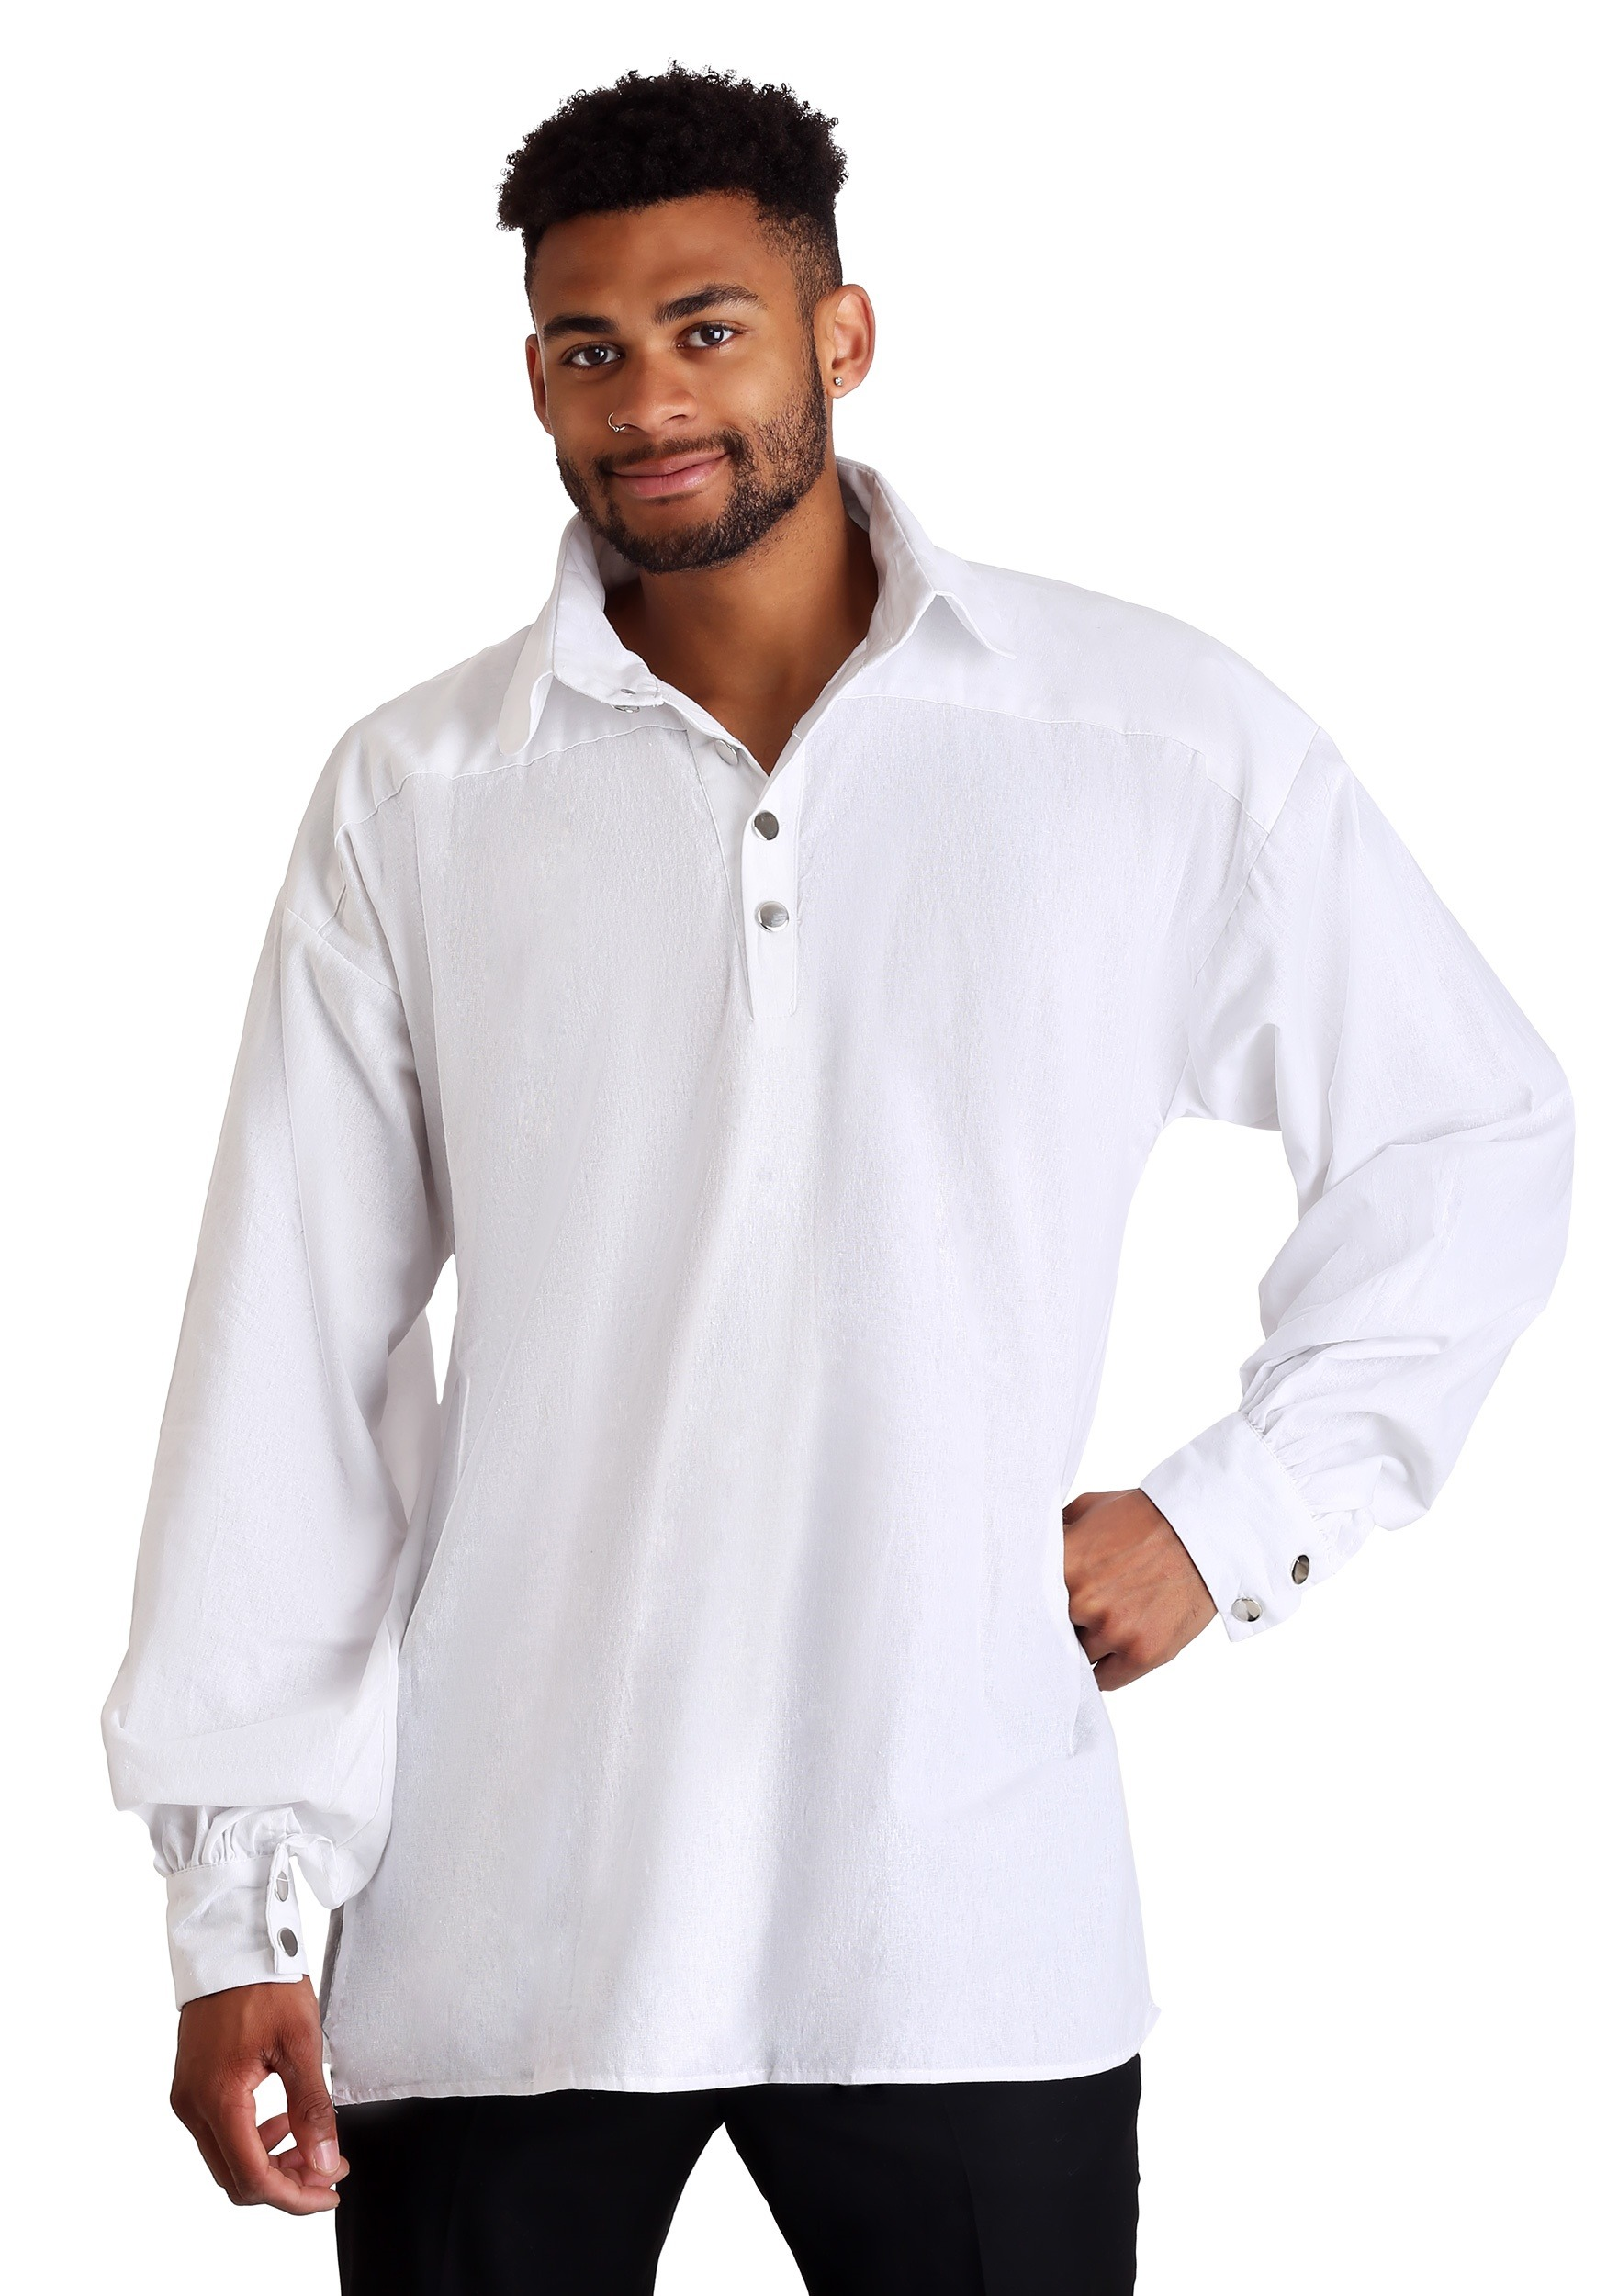 Mens Renaissance Shirt - Pirate Shirt - Peasant Shirt for Medieval Fair Costume / Renaissance Costume FP4XCd6lB